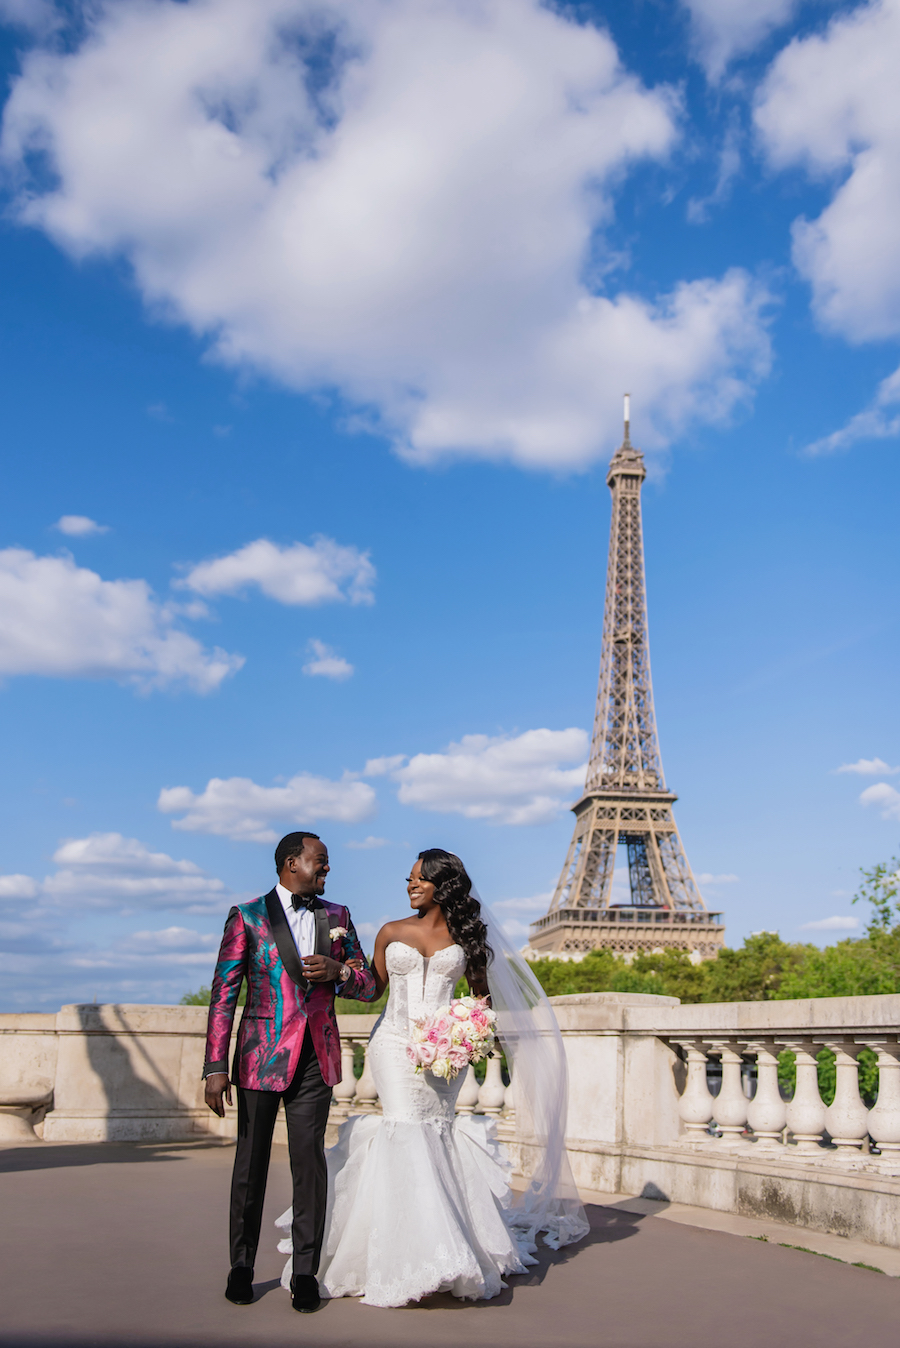 Funke-and-Jide_wedding_fall-2018_munaluchi-bride-magazine_munaluchi_decor_fashion_bridal_gown_paris_france_paris-wedding_multicultural-love25.jpg